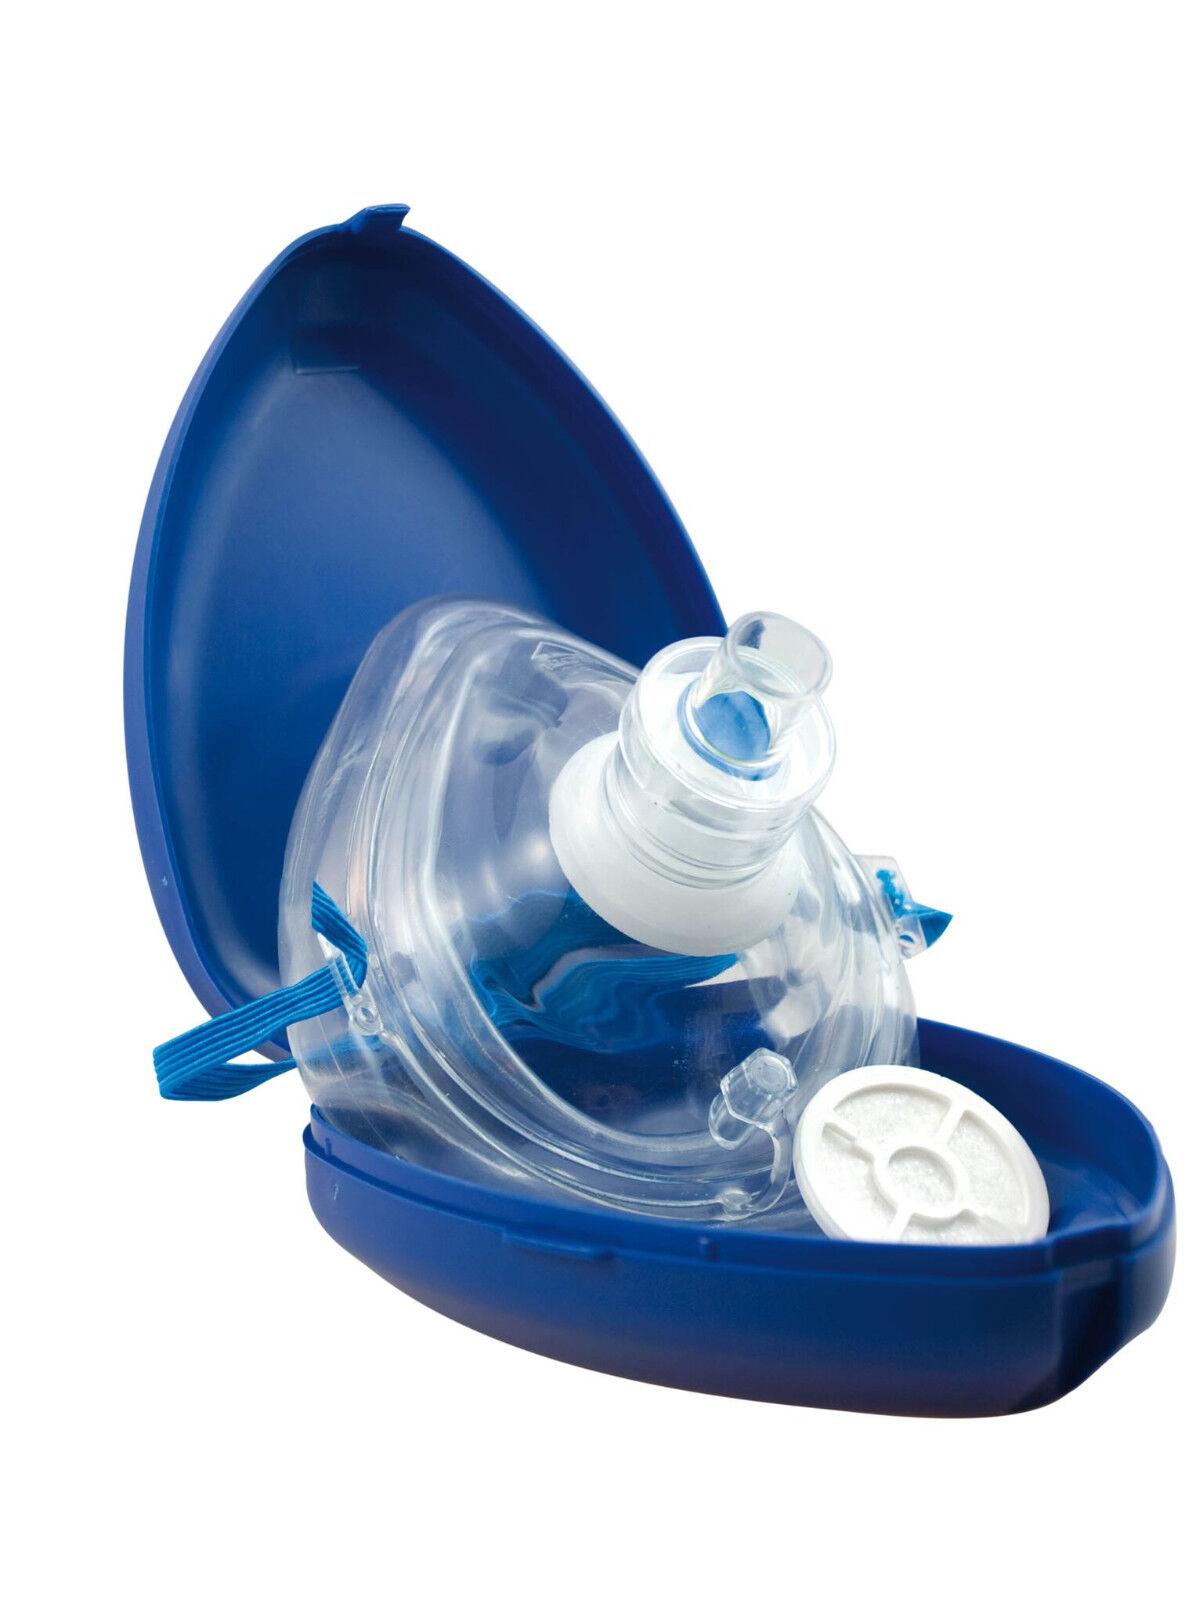 1x AERObag® Taschenmaske (Pocket Mask Beatmungshilfe Beatmungsmaske Reanimation)